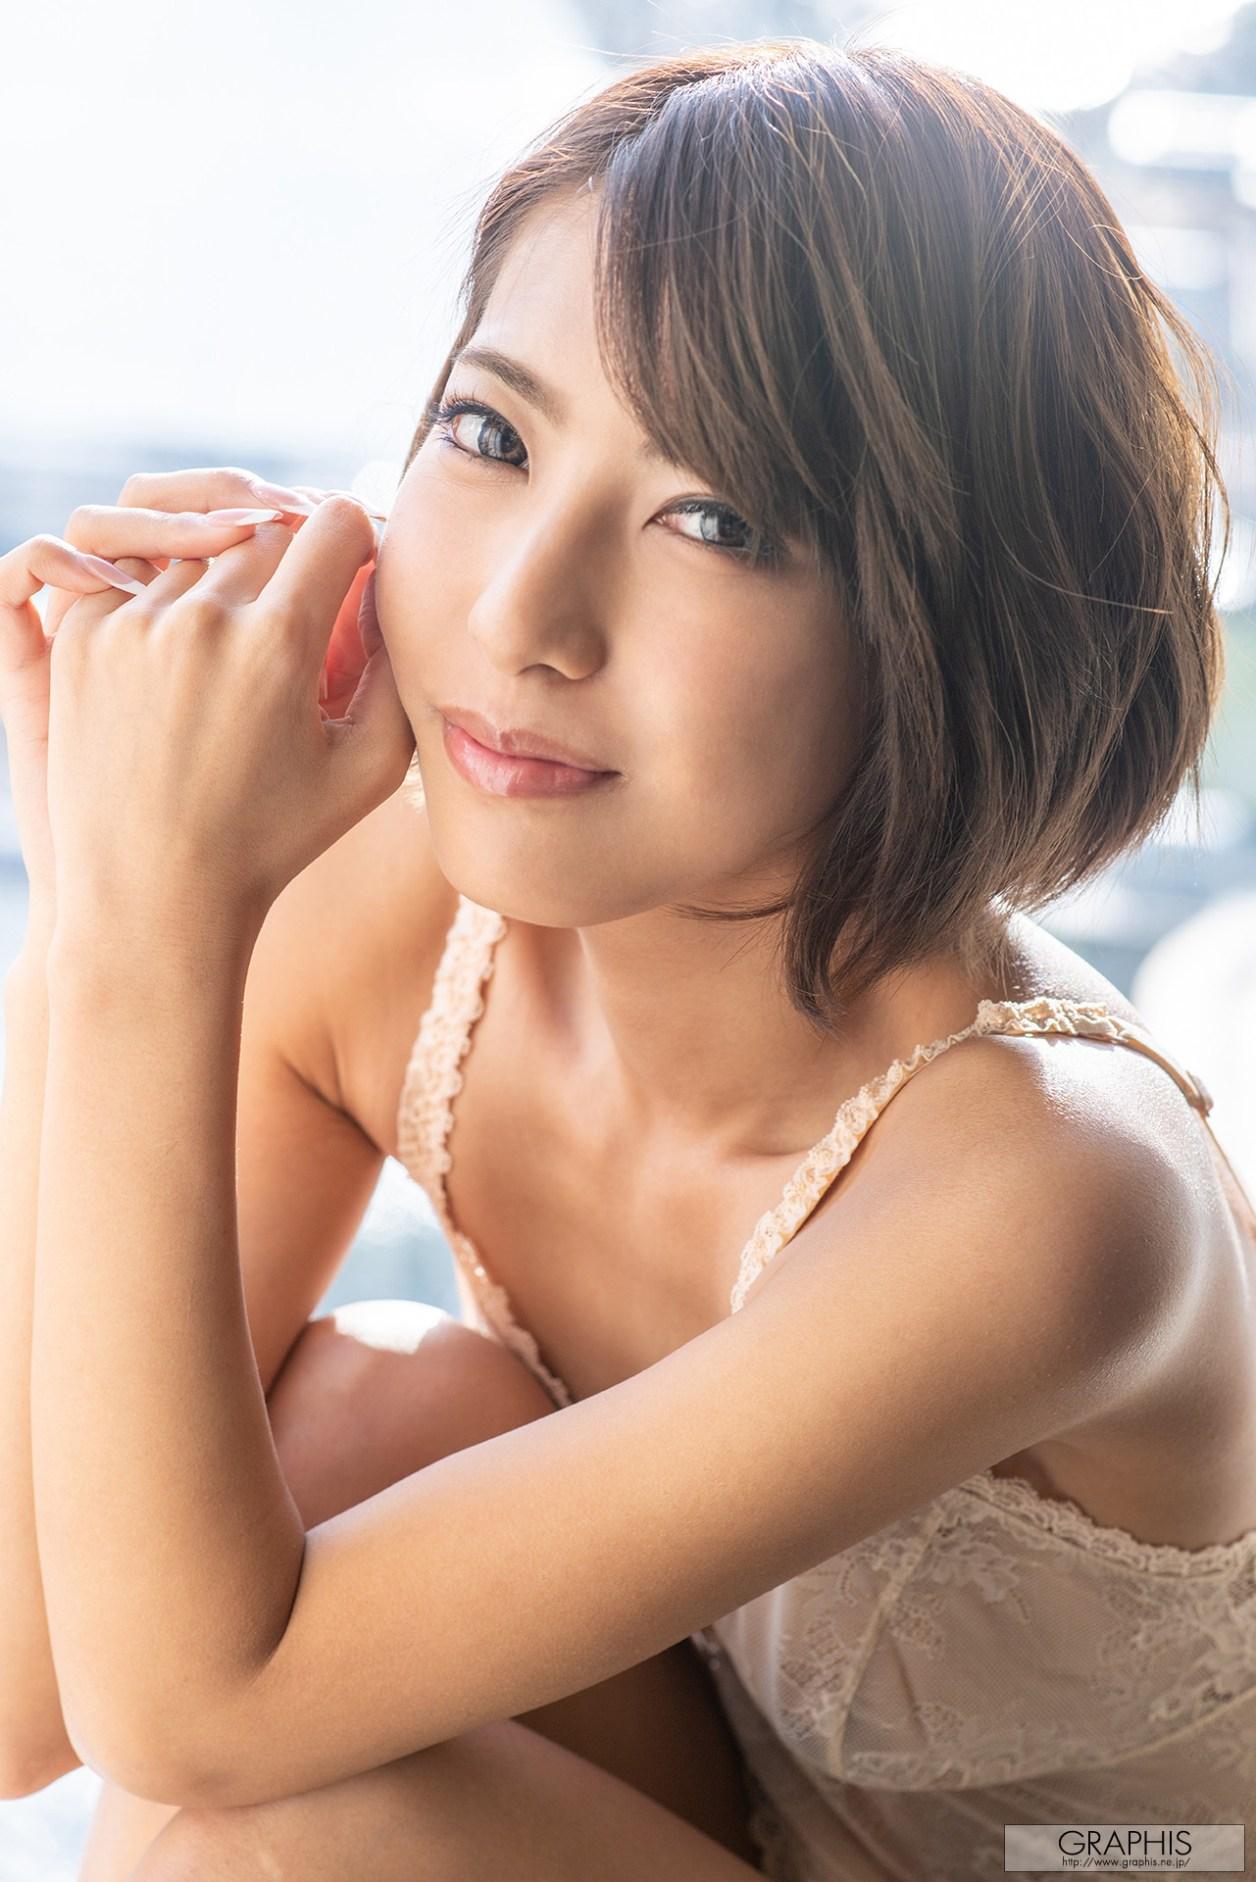 ryo-harusaki-daily025